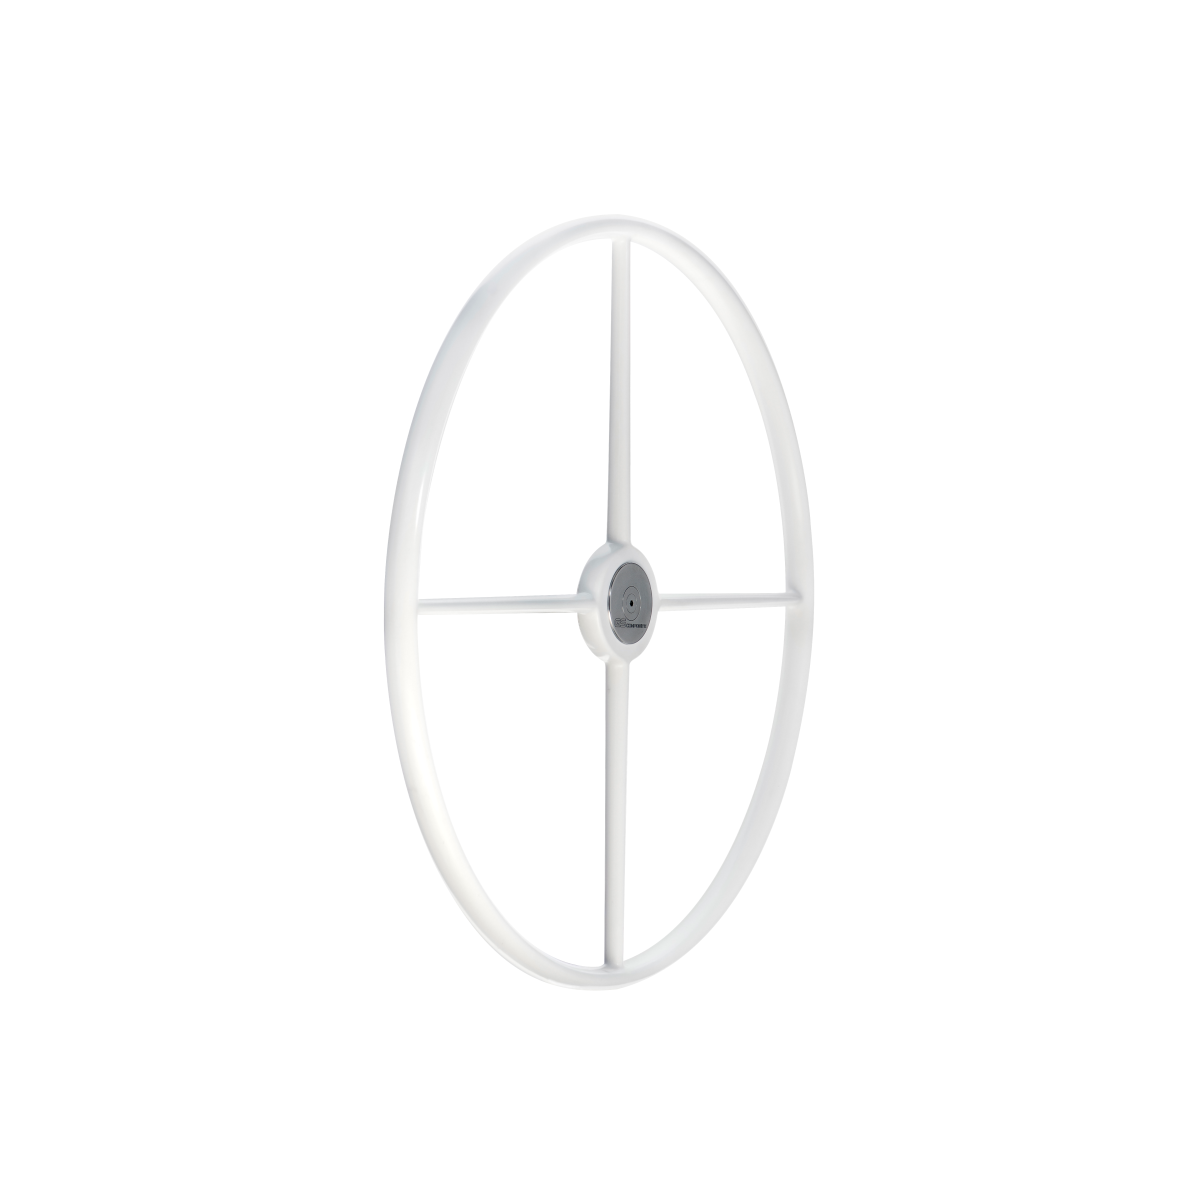 Carbon Steering Wheel, classic 4-spoke